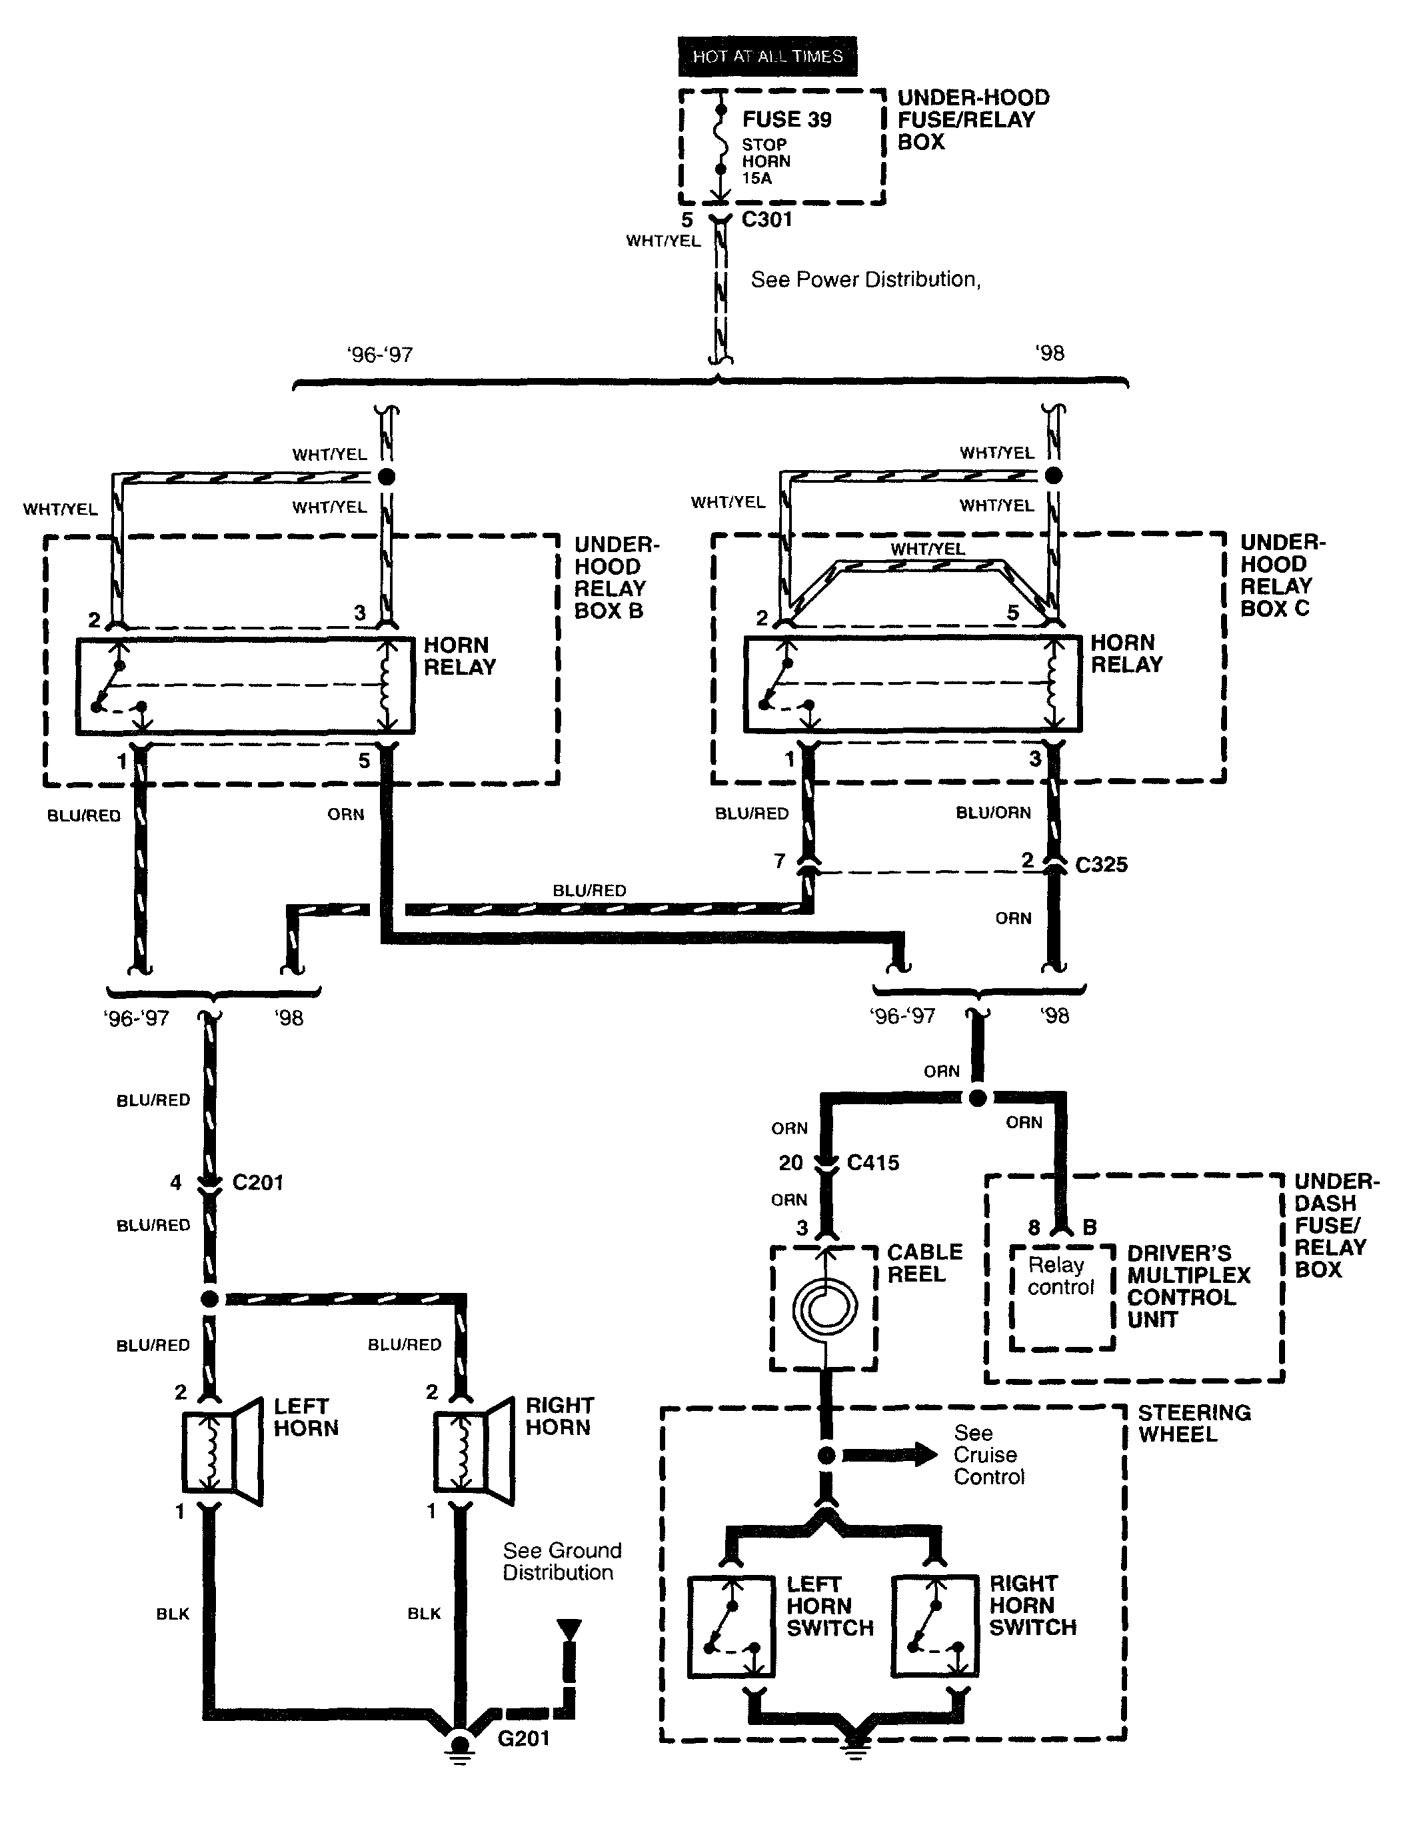 98 Cavalier Anti Theft Wiring Diagram | Wiring Liry on